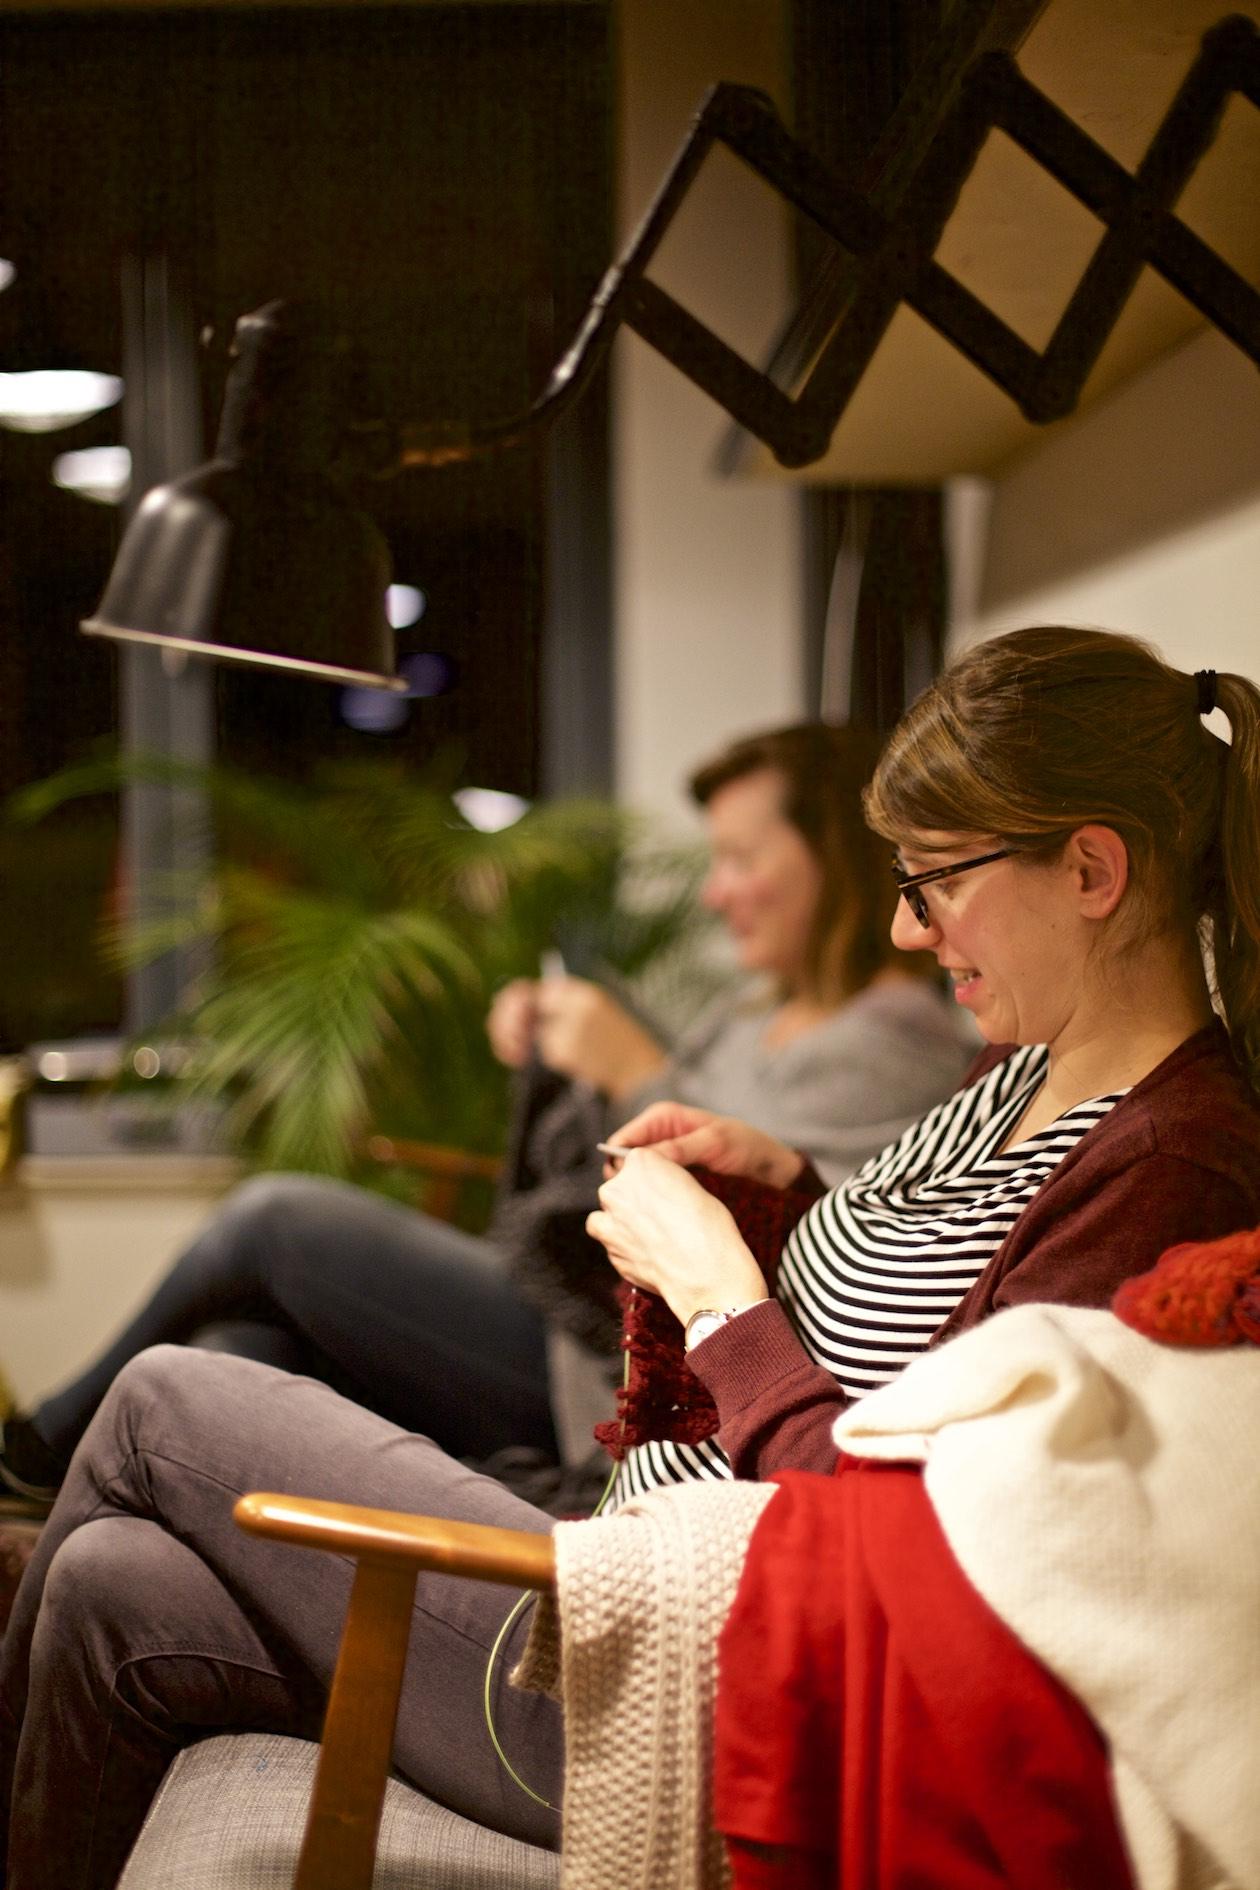 Start to knit! New workshops online.